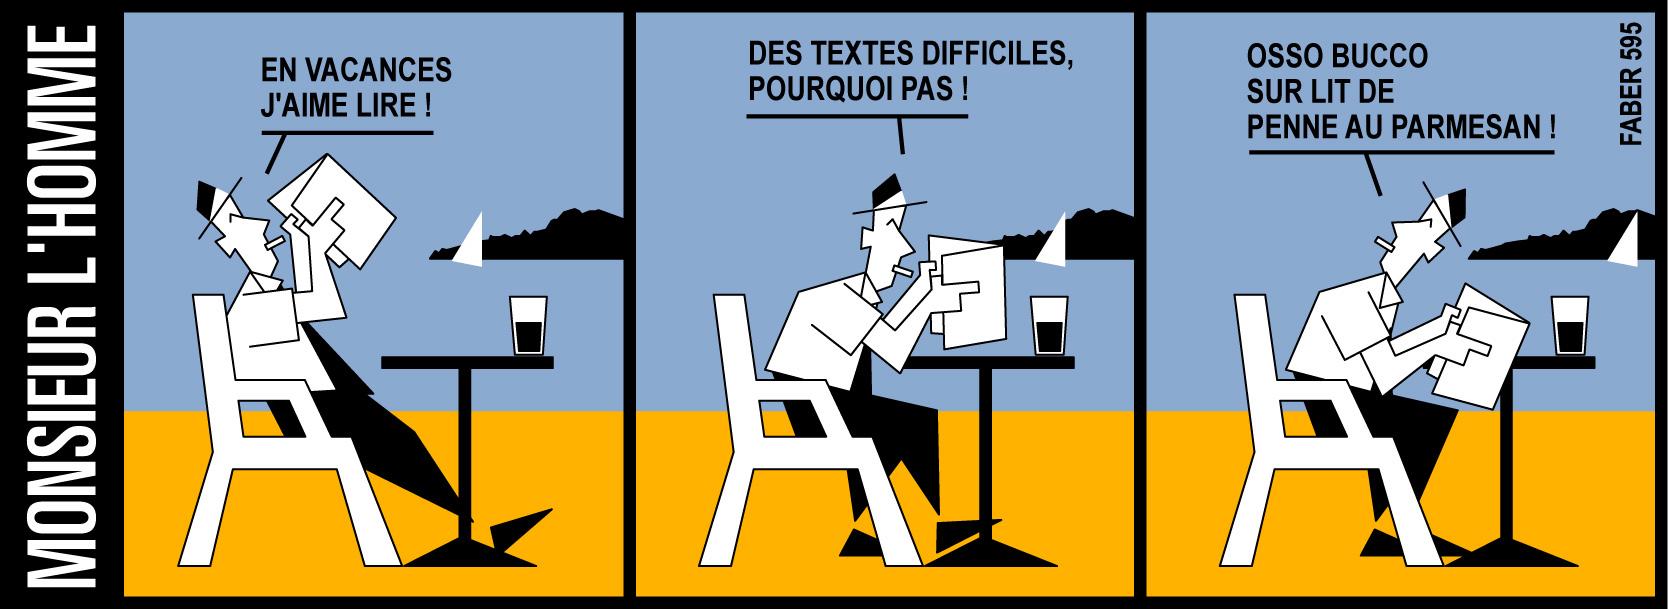 595-lire-color.1217363933.jpg